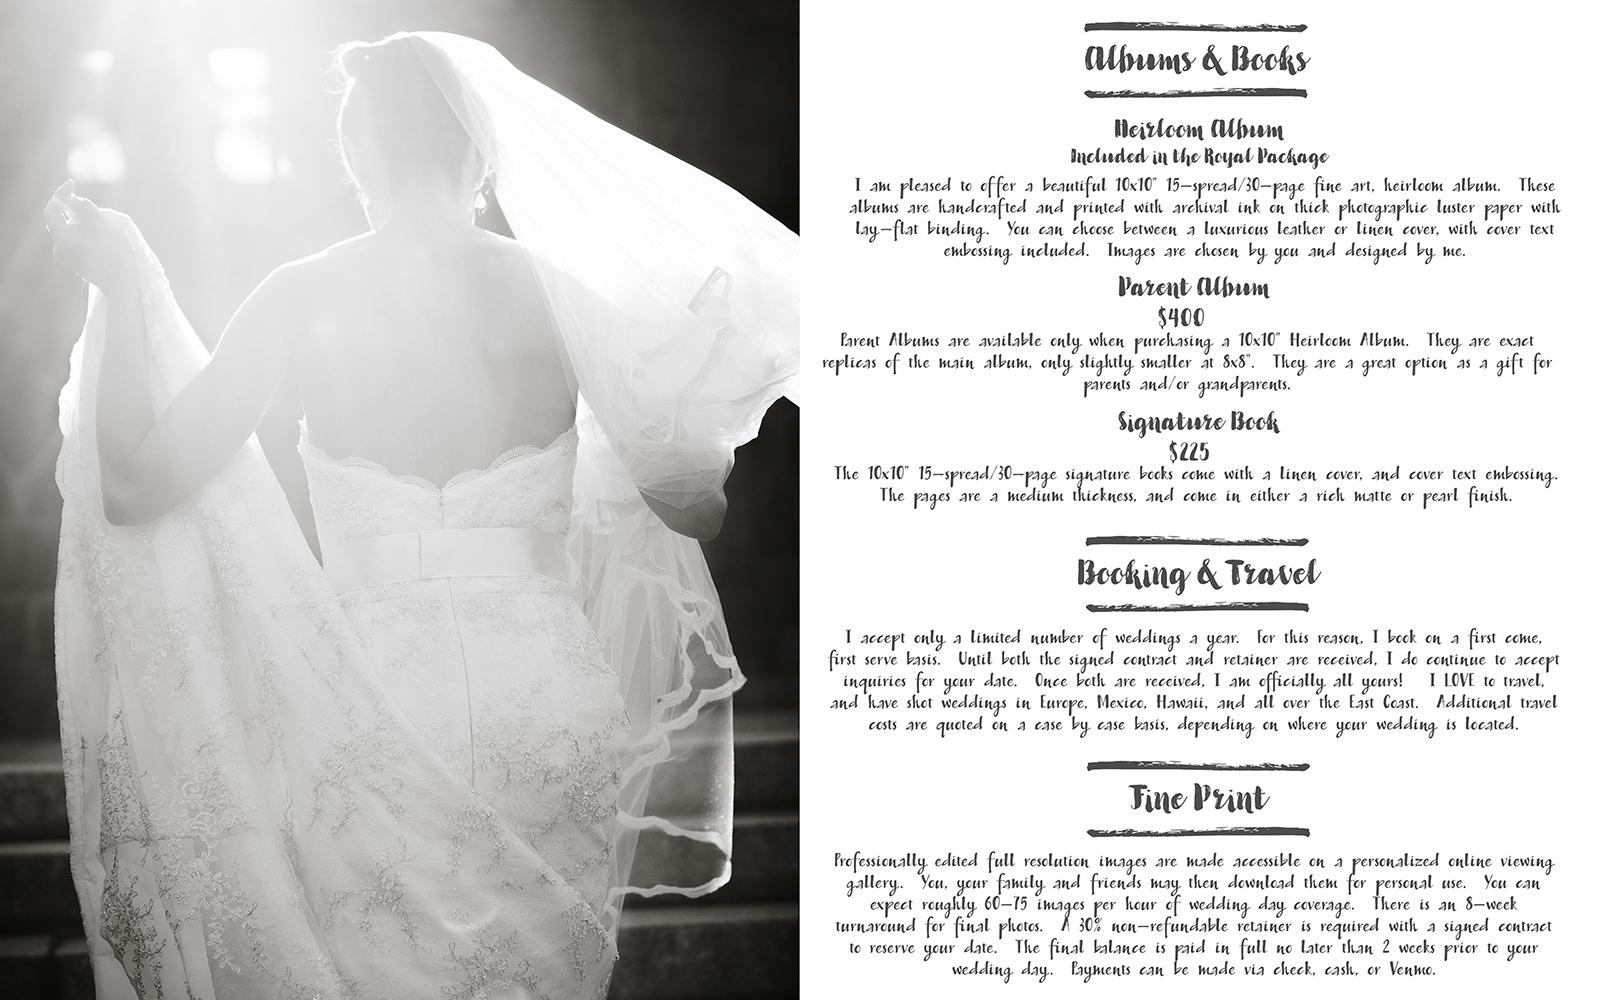 Pricing Guide 2019 fine print.jpg